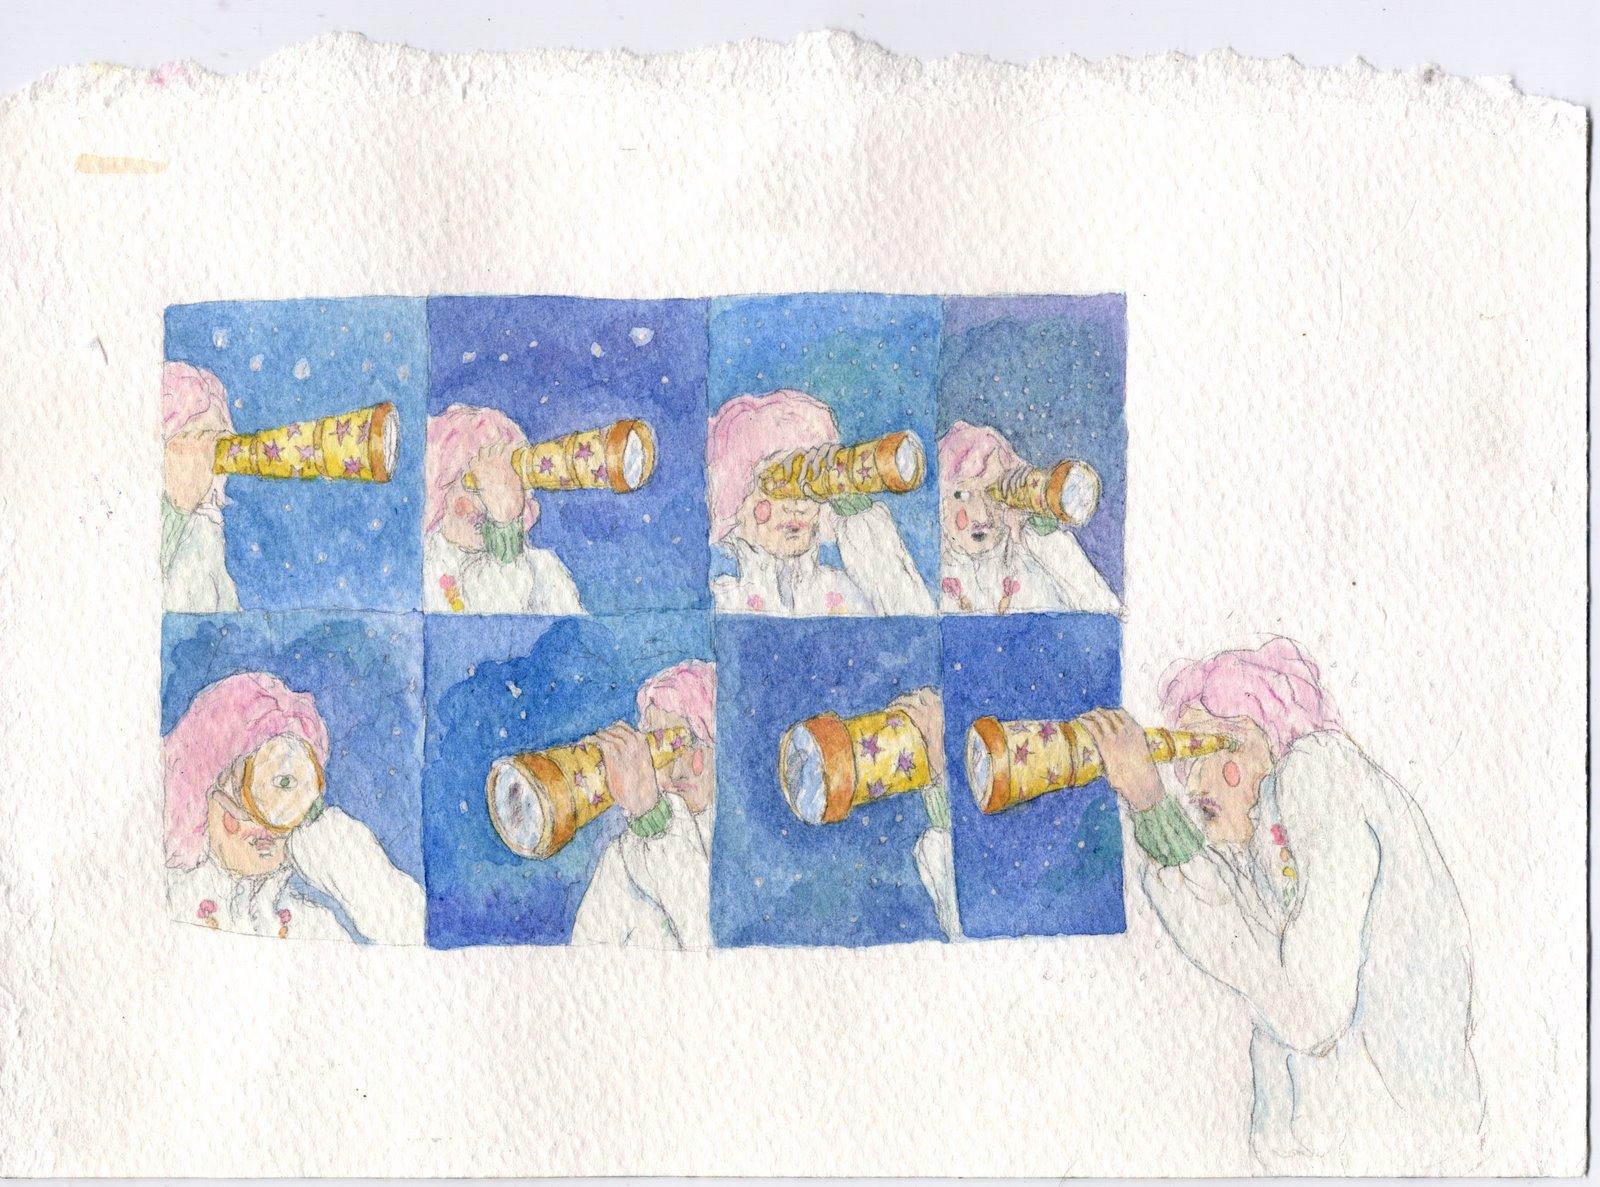 [telescopenotice]